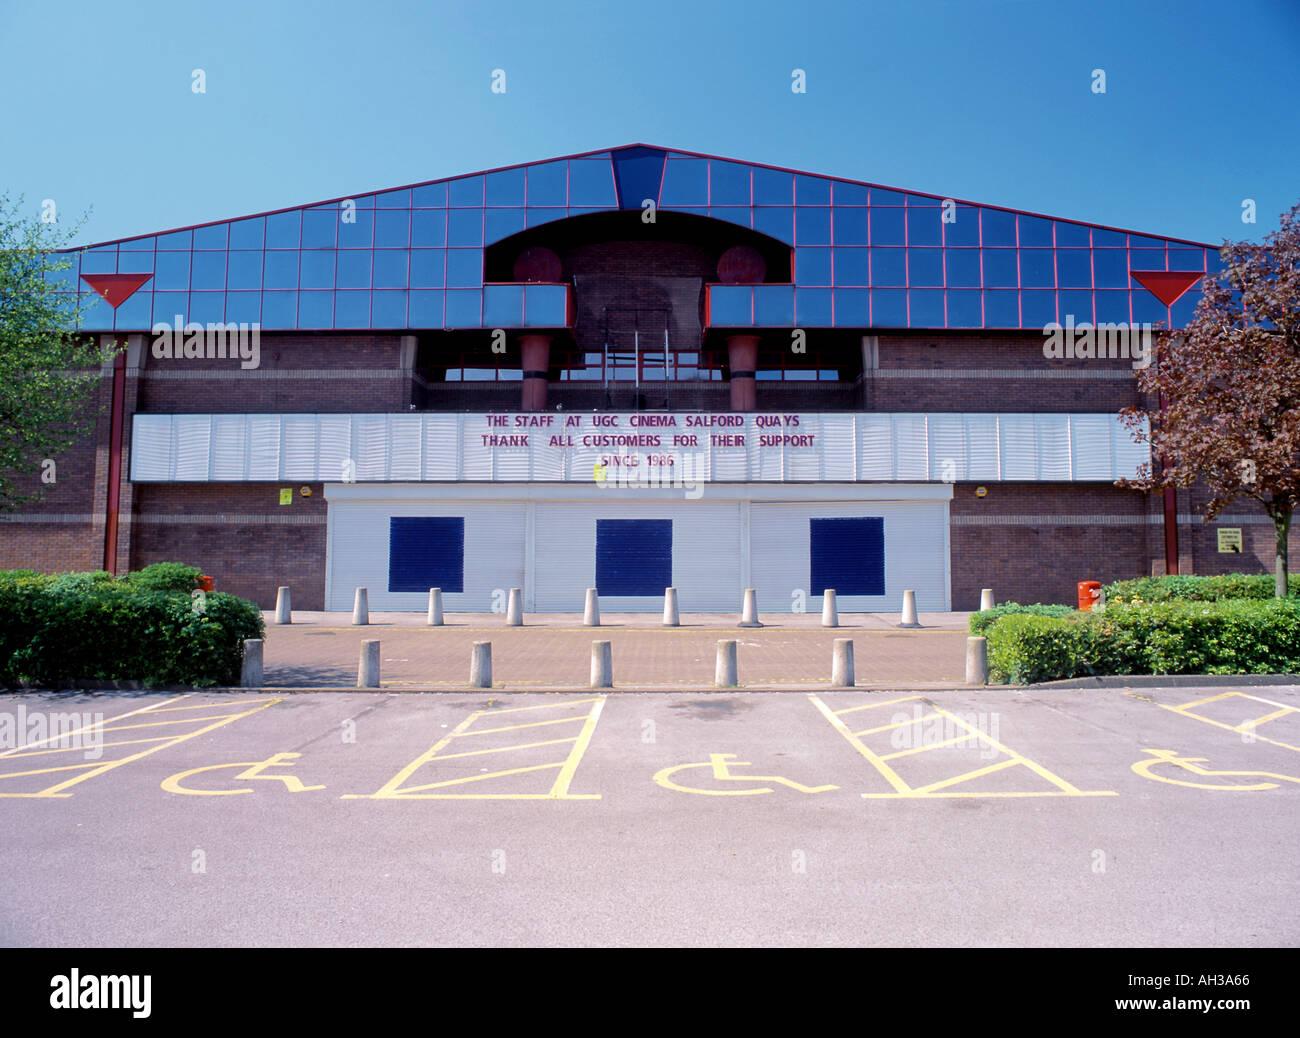 Fermé cinema Salford Quays Photo Stock